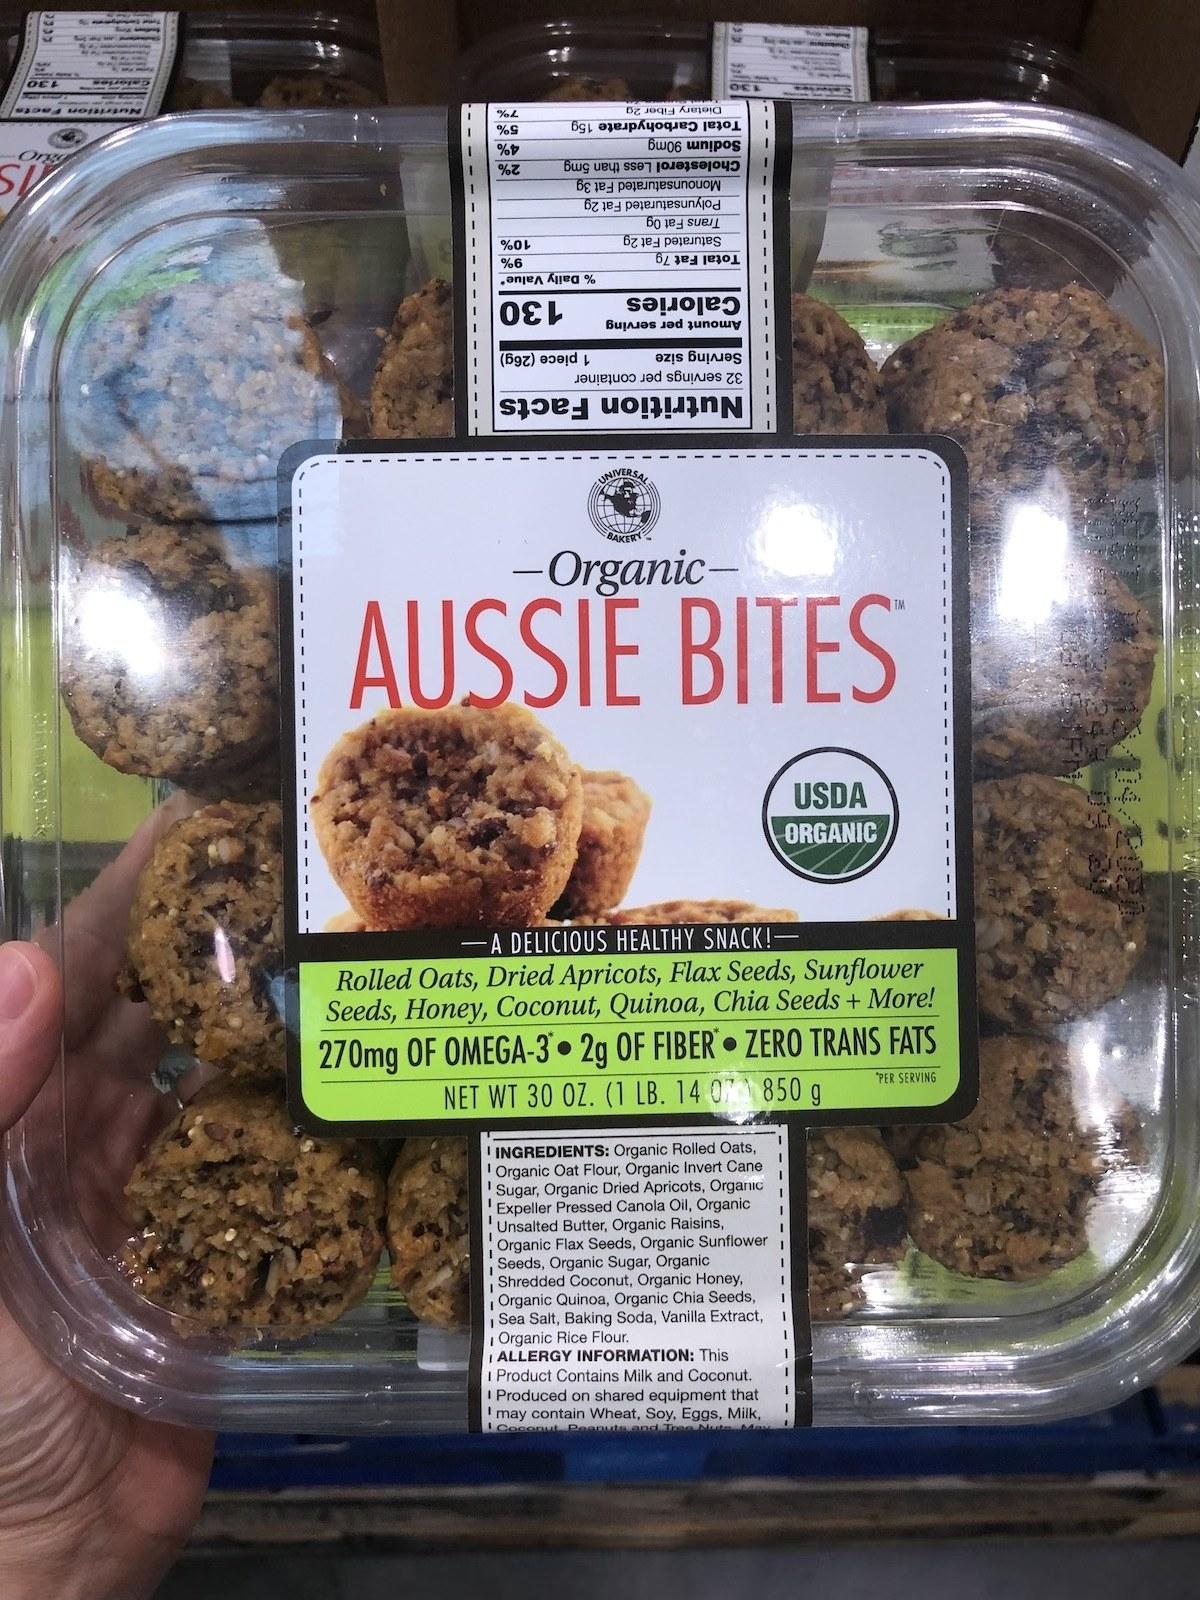 A box of Costco Aussie Bites